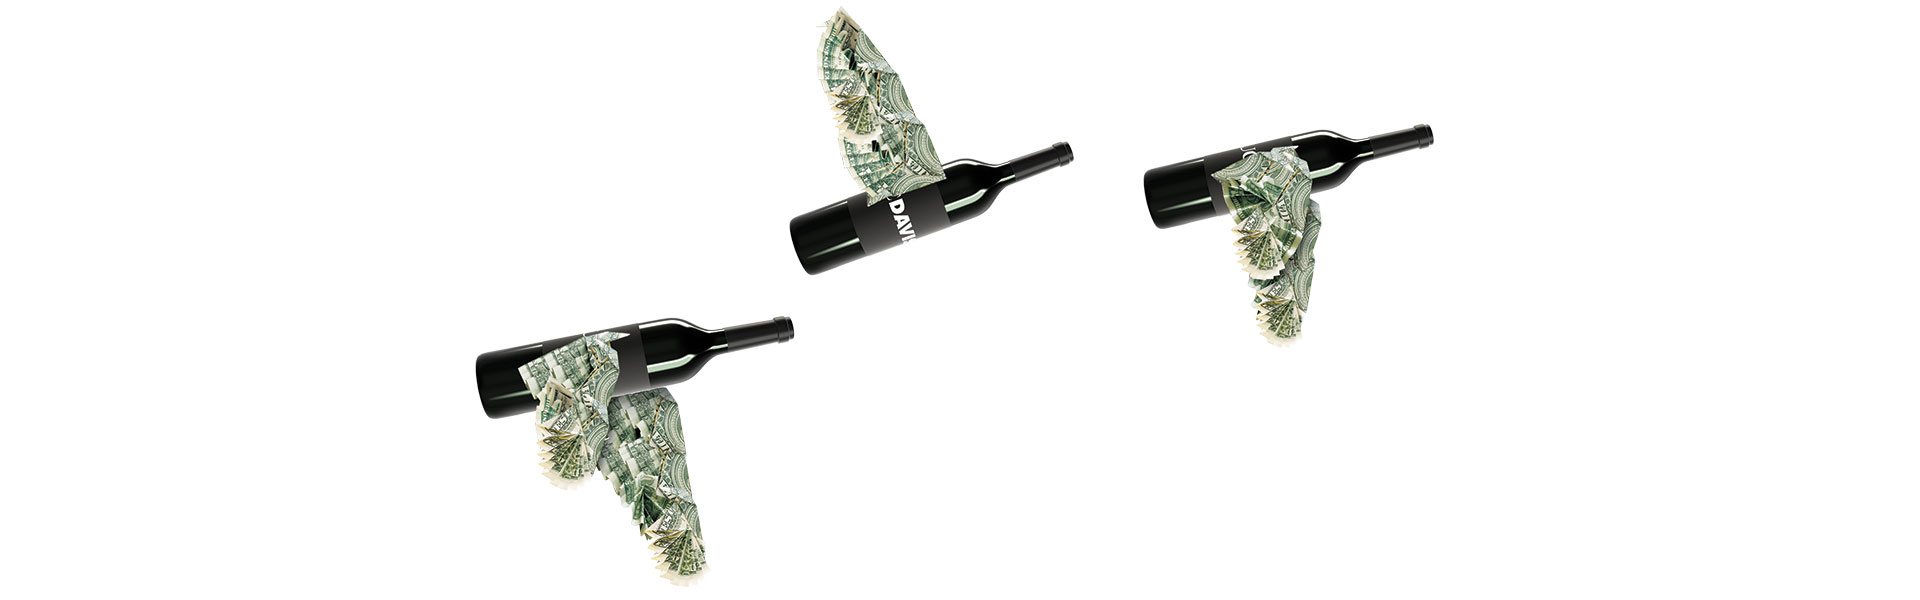 wine bottles with money wings flying like a flock of birds